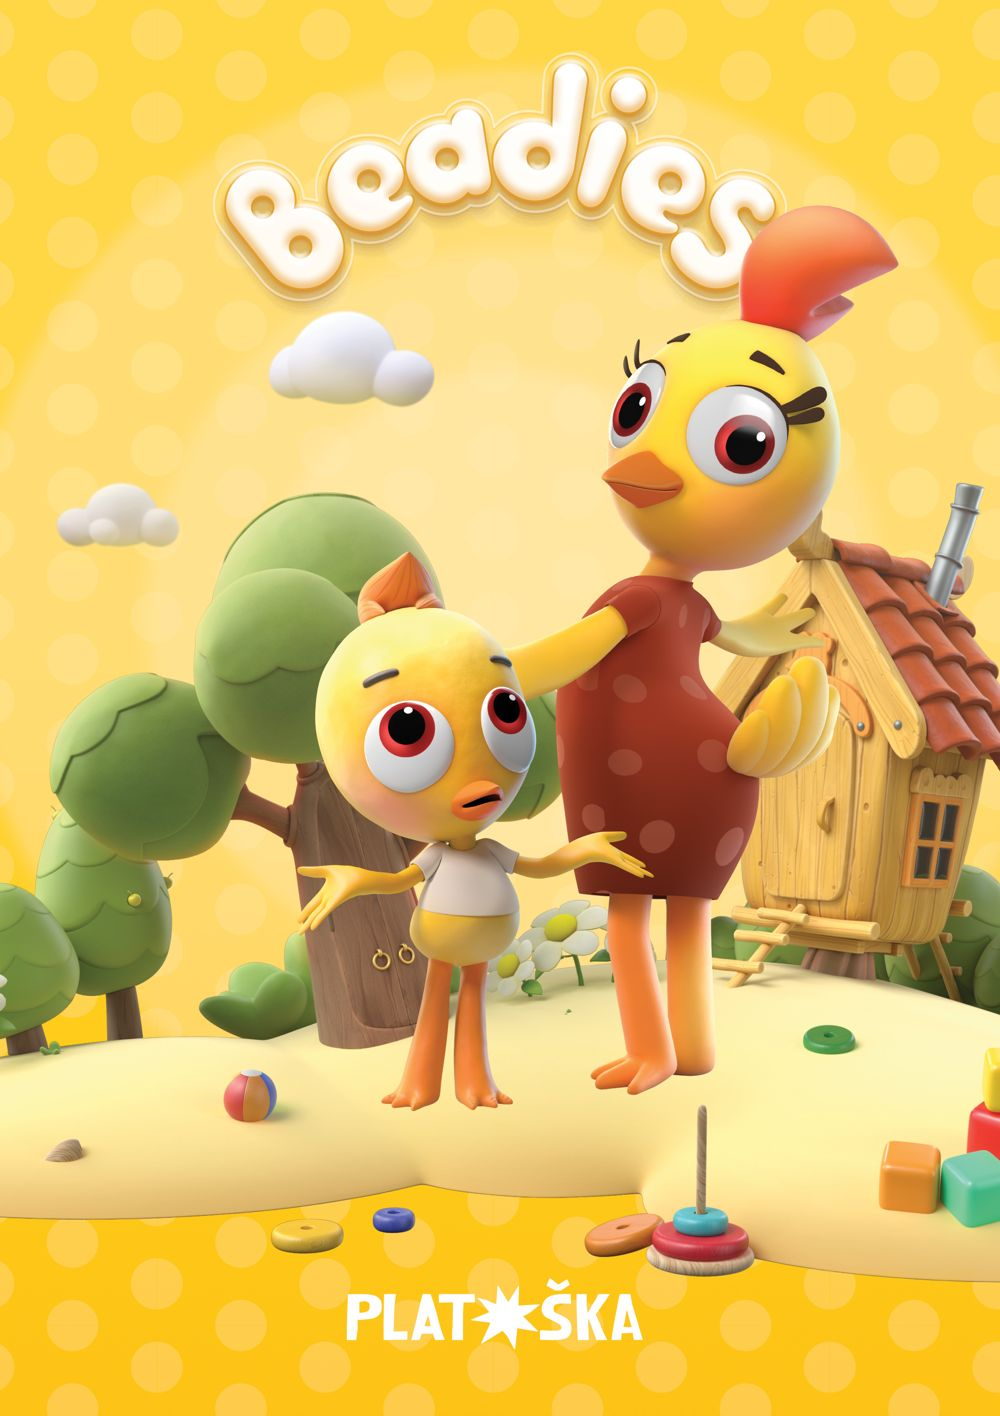 "Beadies ""width ="" 1000 ""height ="" 1416 ""class ="" size-full wp-image-280973 ""srcset ="" https://www.cartonionline.com/wordpress/wp-content/uploads/2021/02/Platoshka-Animation-Studio-lancia-quattro-nuovi-spettacoli-per-bambini.jpg 1000w, https://www.animationmagazine.net/wordpress/wp-content/uploads/Beadies2-169x240.jpg 169w, https://www.animationmagazine.net/wordpress/wp-content/uploads/Beadies2-706x1000.jpg 706w, https://www.animationmagazine.net/wordpress/wp-content/uploads/Beadies2-768x1087.jpg 768w ""sizes ="" (larghezza massima: 1000px) 100vw, 1000px ""/>  <p class="